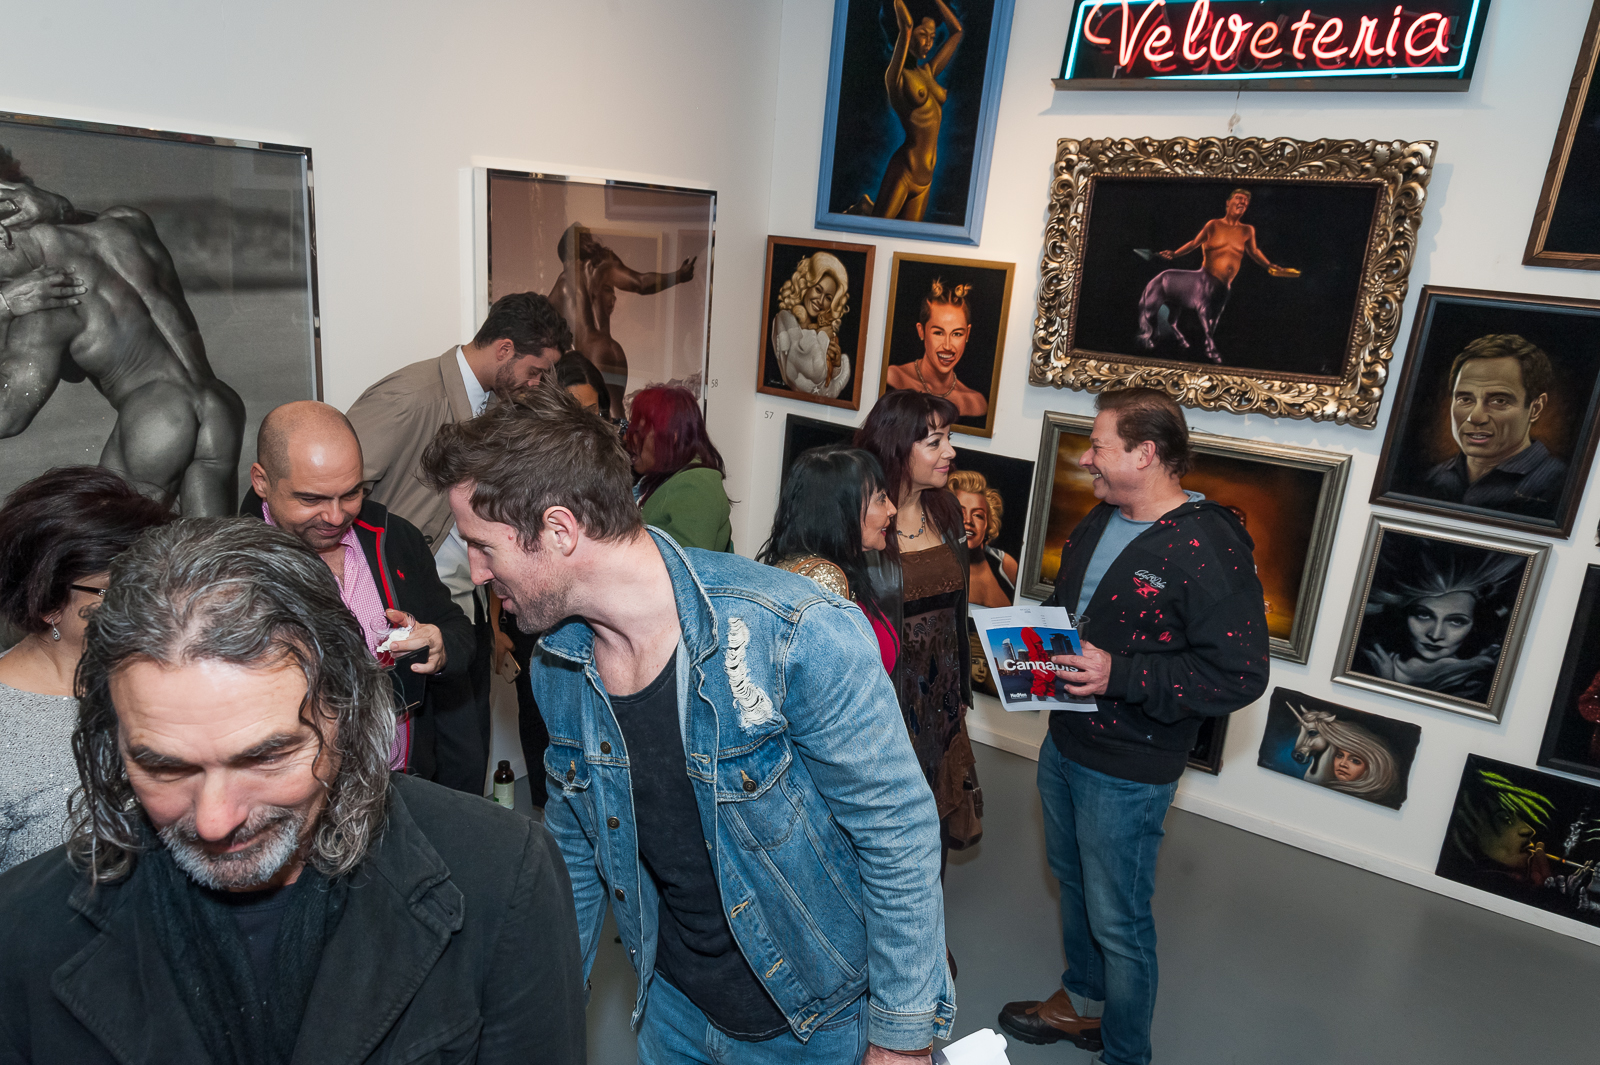 Artist Corner Gallery Feb 13 2019-0478.jpg